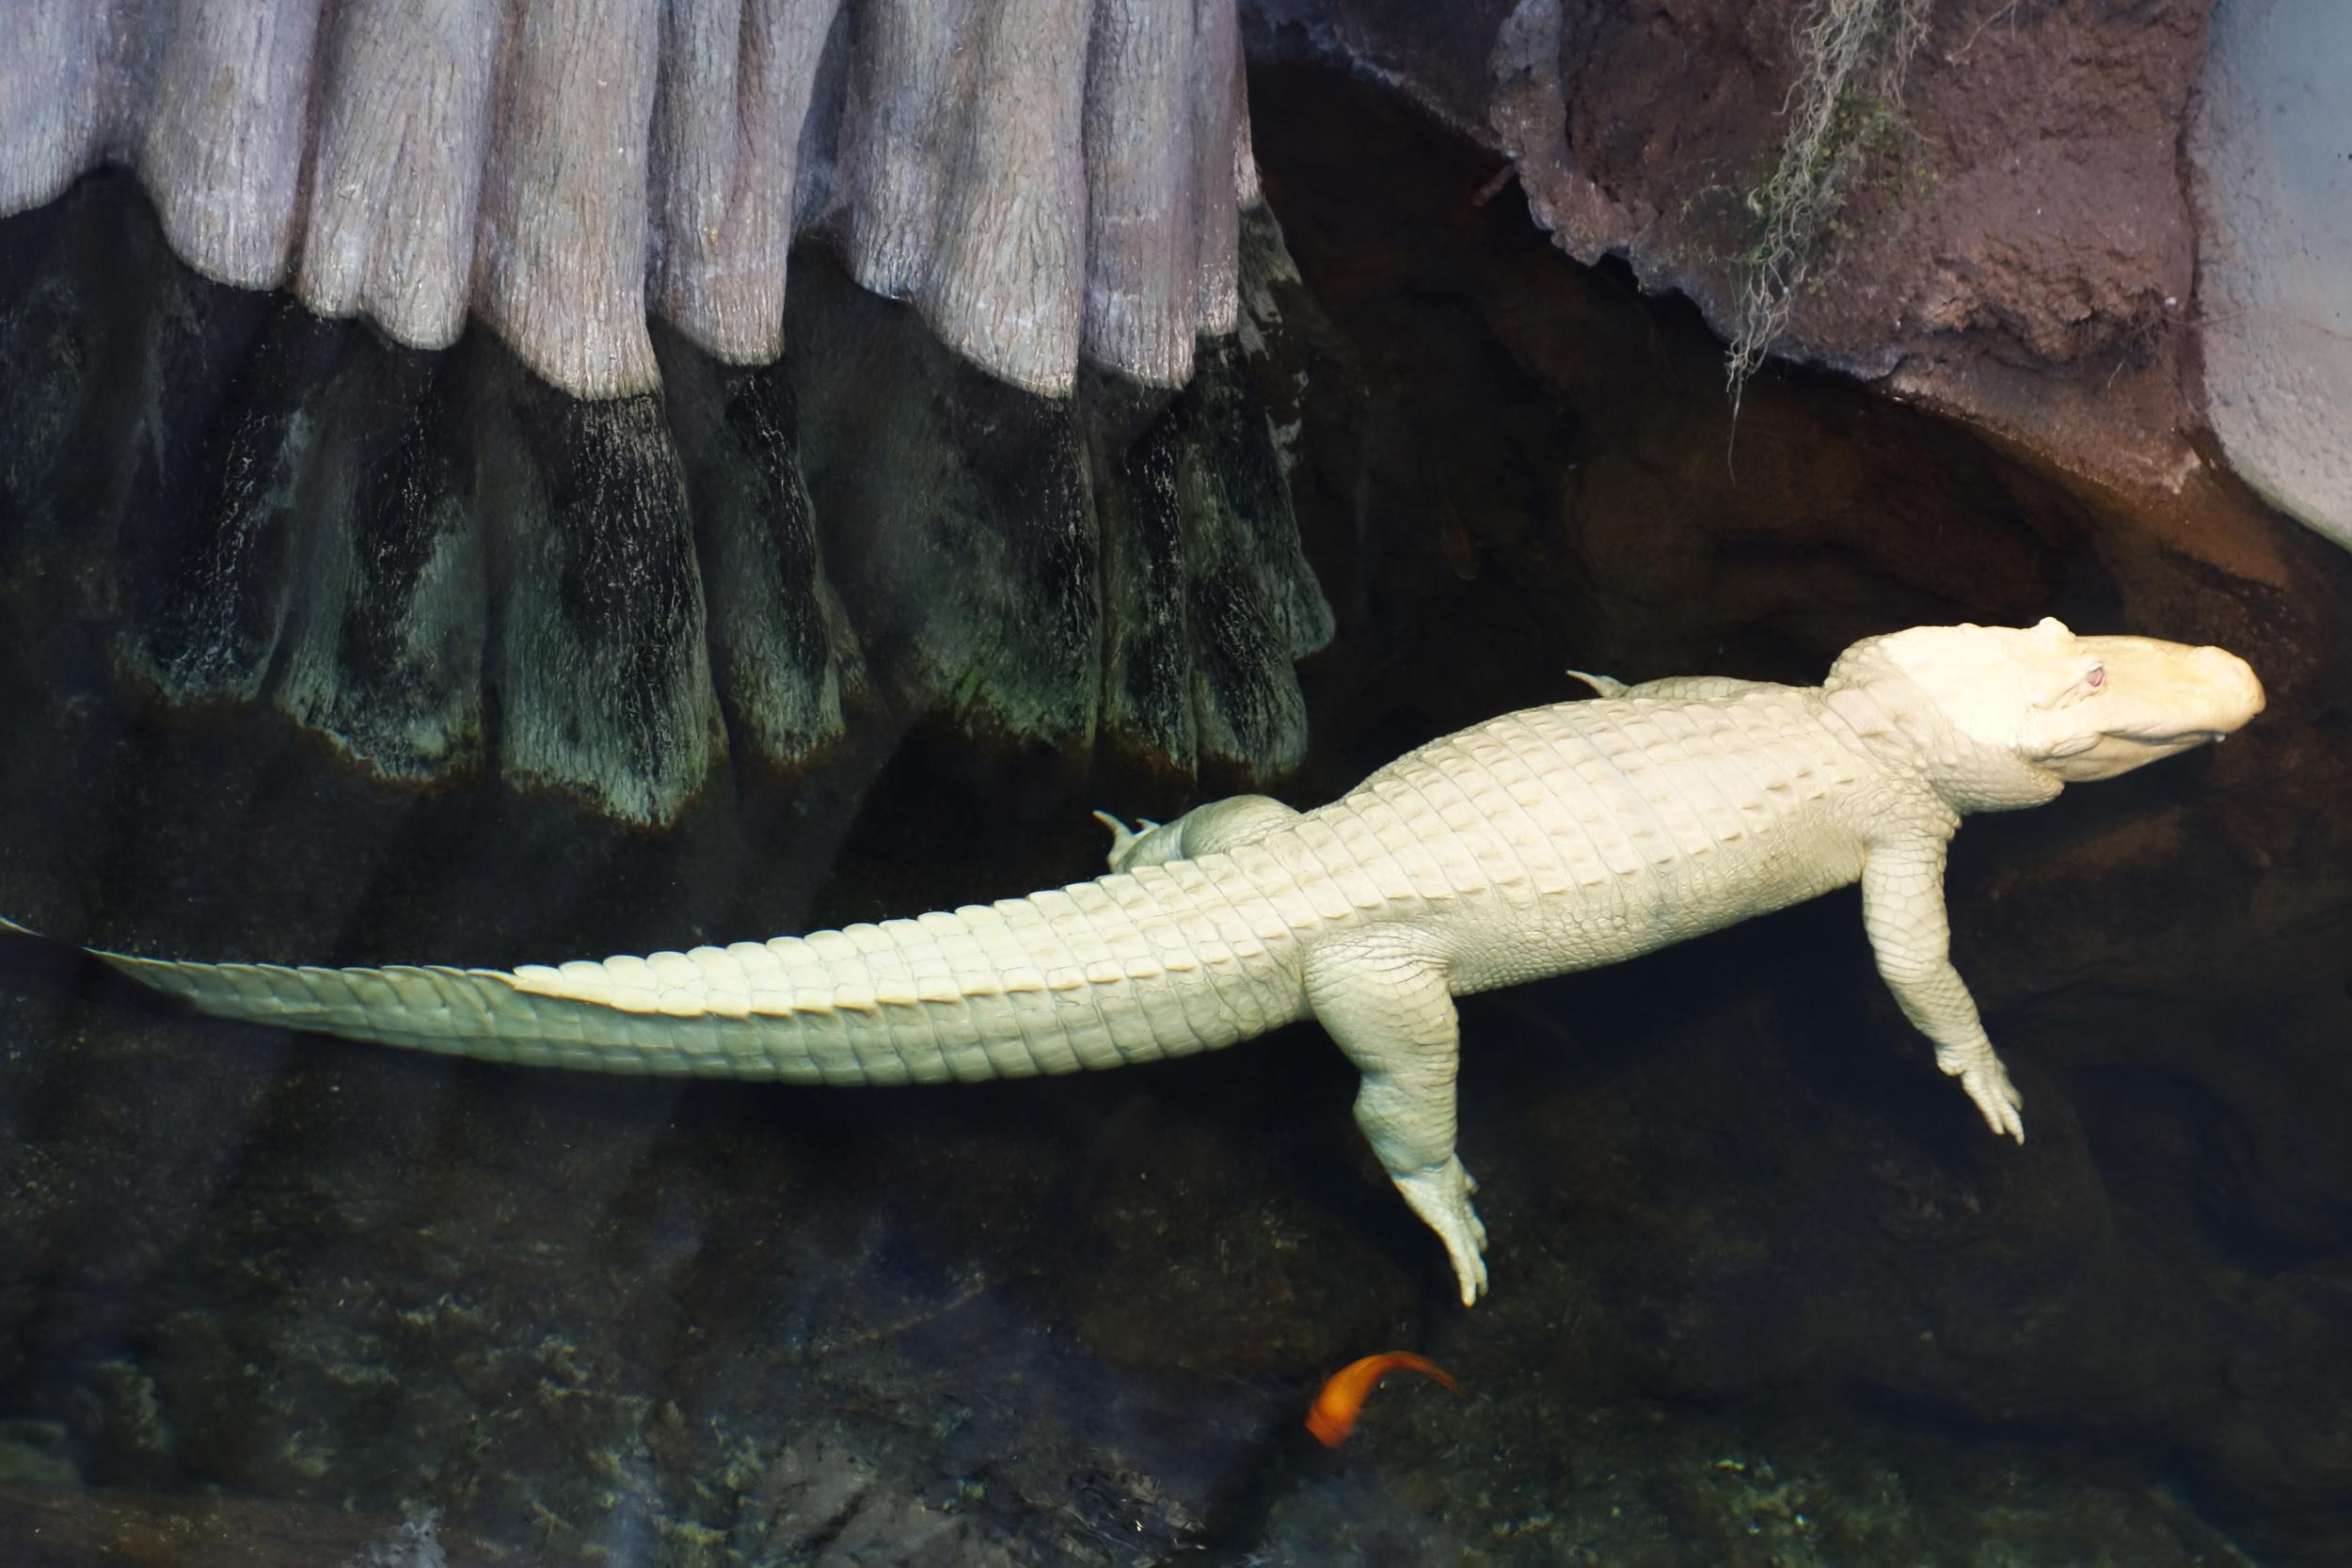 DSC00534 Claude the Albino Alligator.JPG